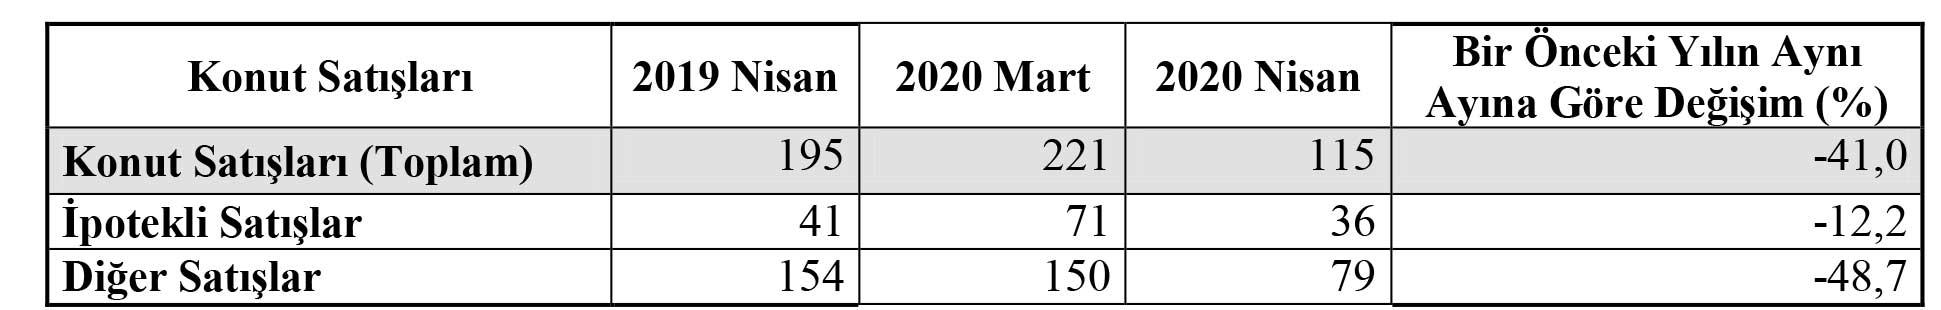 karaman-konut-satislari-nisan-2020.jpg